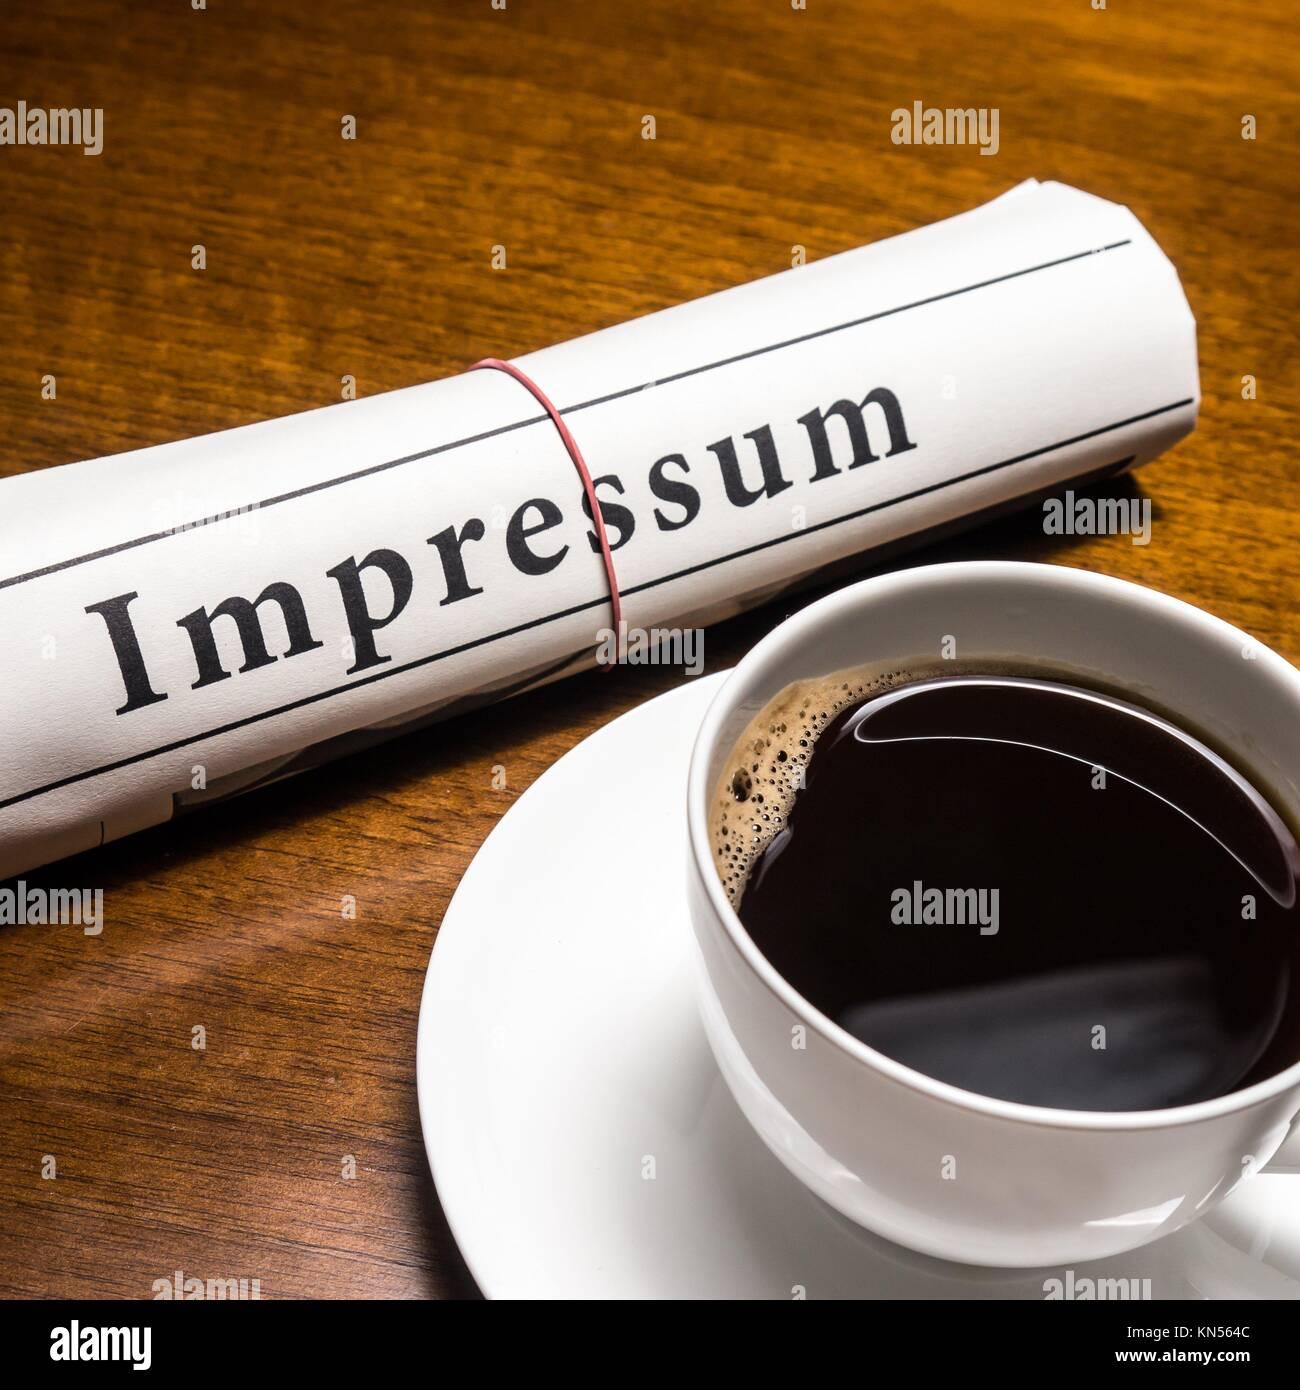 impressum newspaper (german) and cup of coffee. - Stock Image